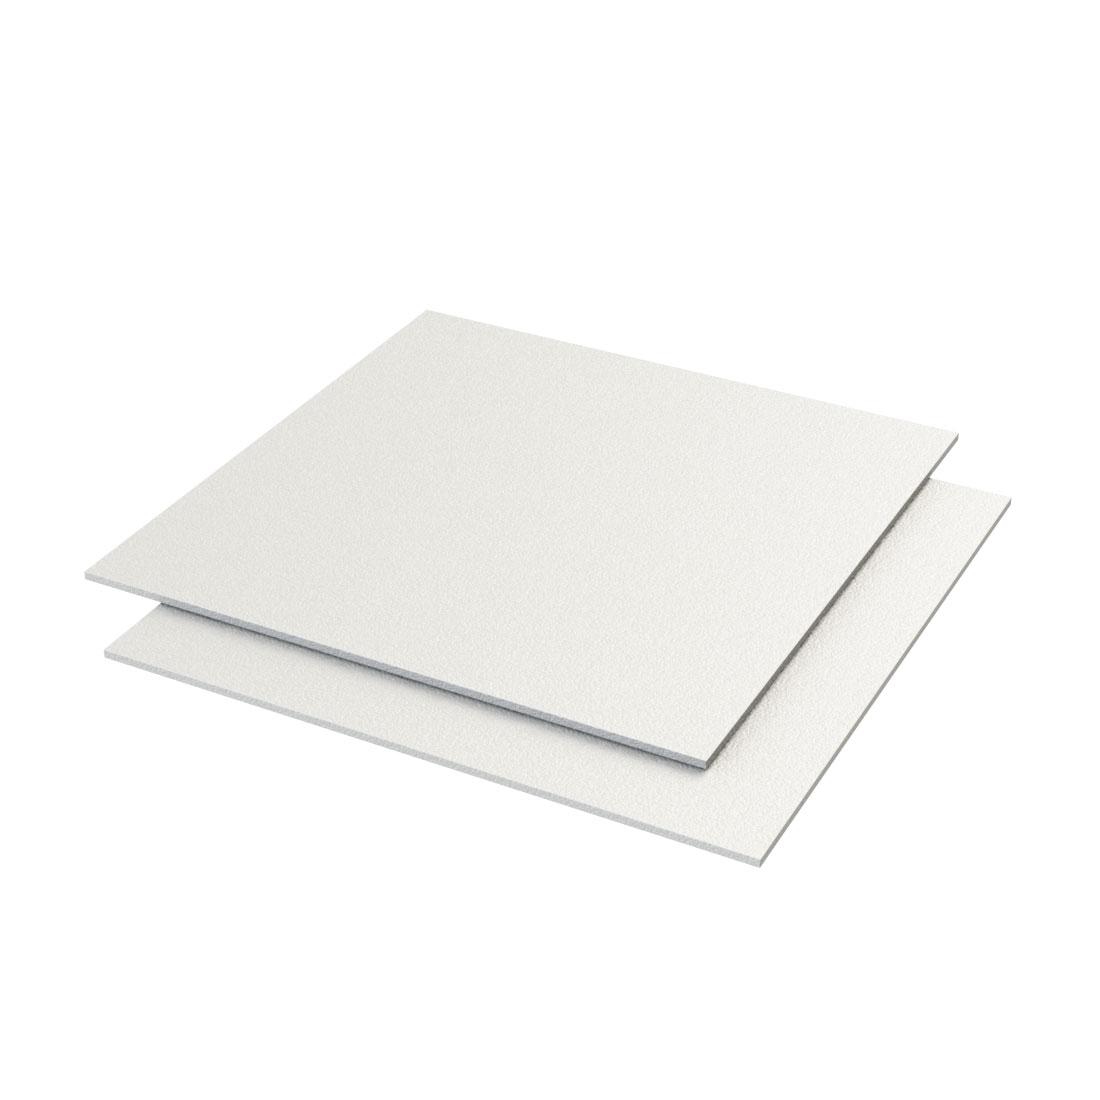 Lexan Cliniwall PC Plaat C6206 Light grey Gy8g179 3050x1300x1,7mm 463273